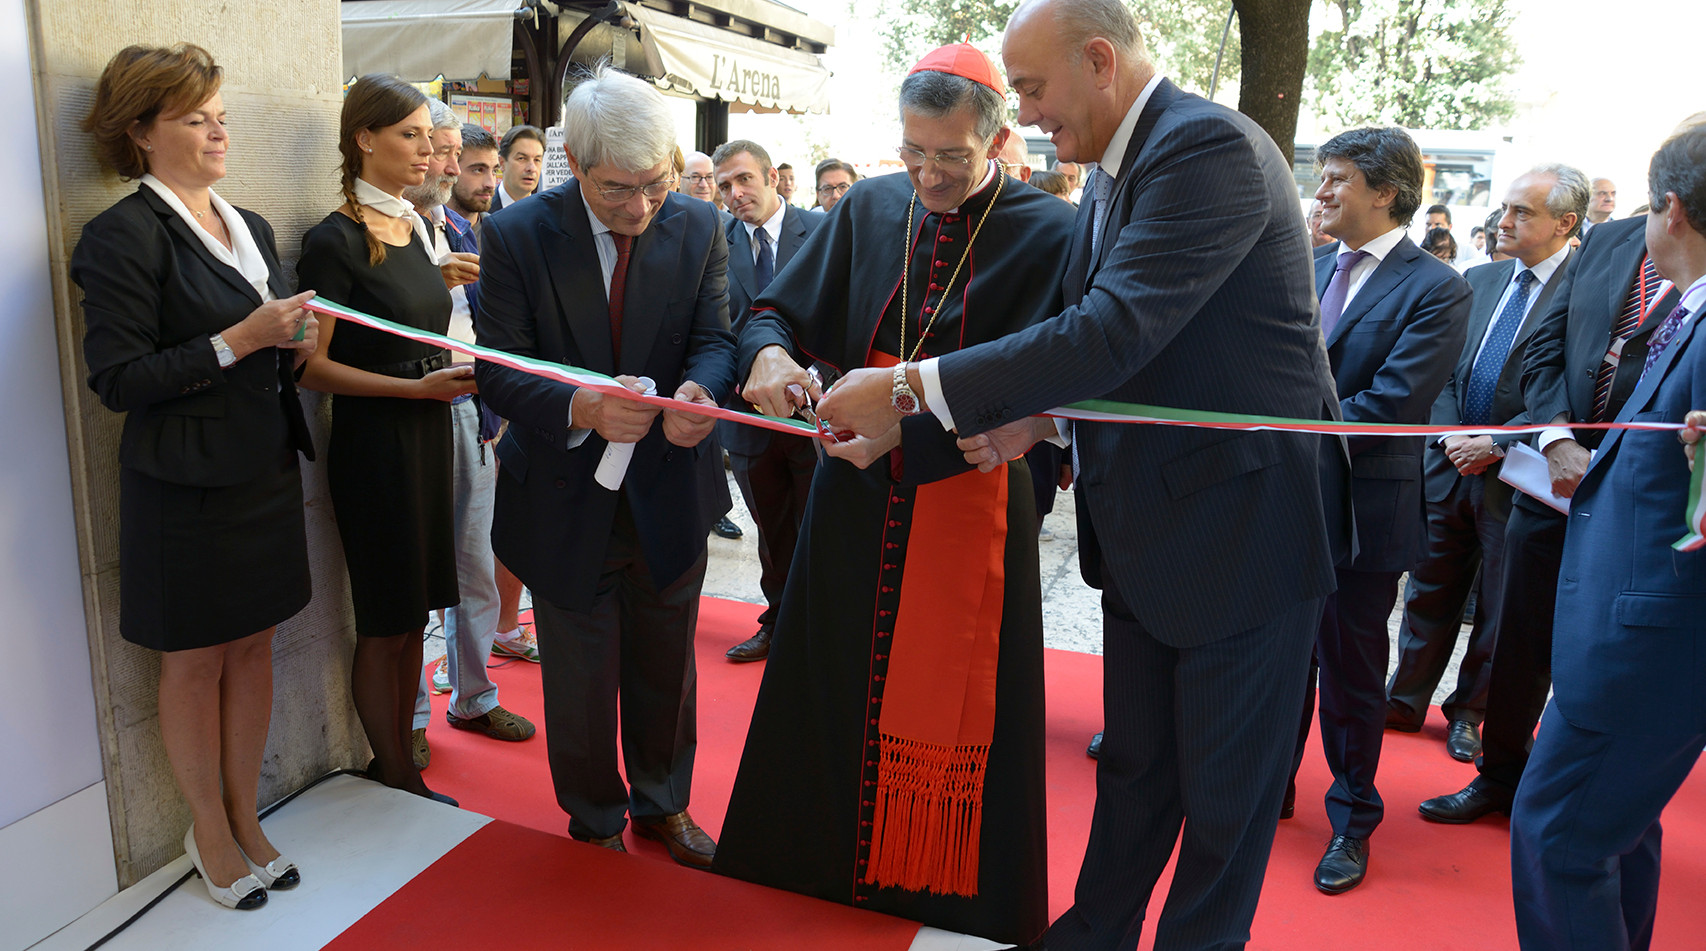 Inaugurazione_salis02.JPG